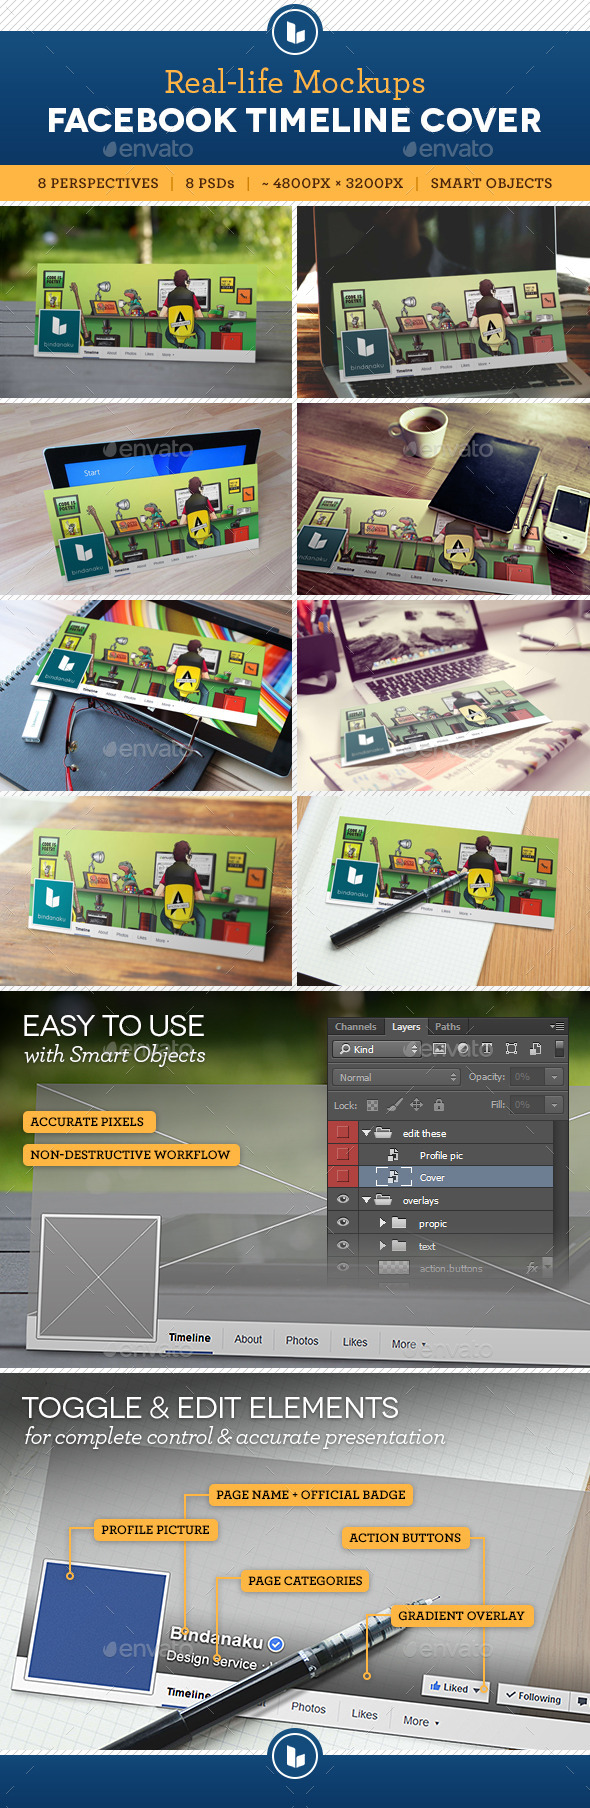 GraphicRiver Facebook Timeline Cover Real-Life Mockups 10271427